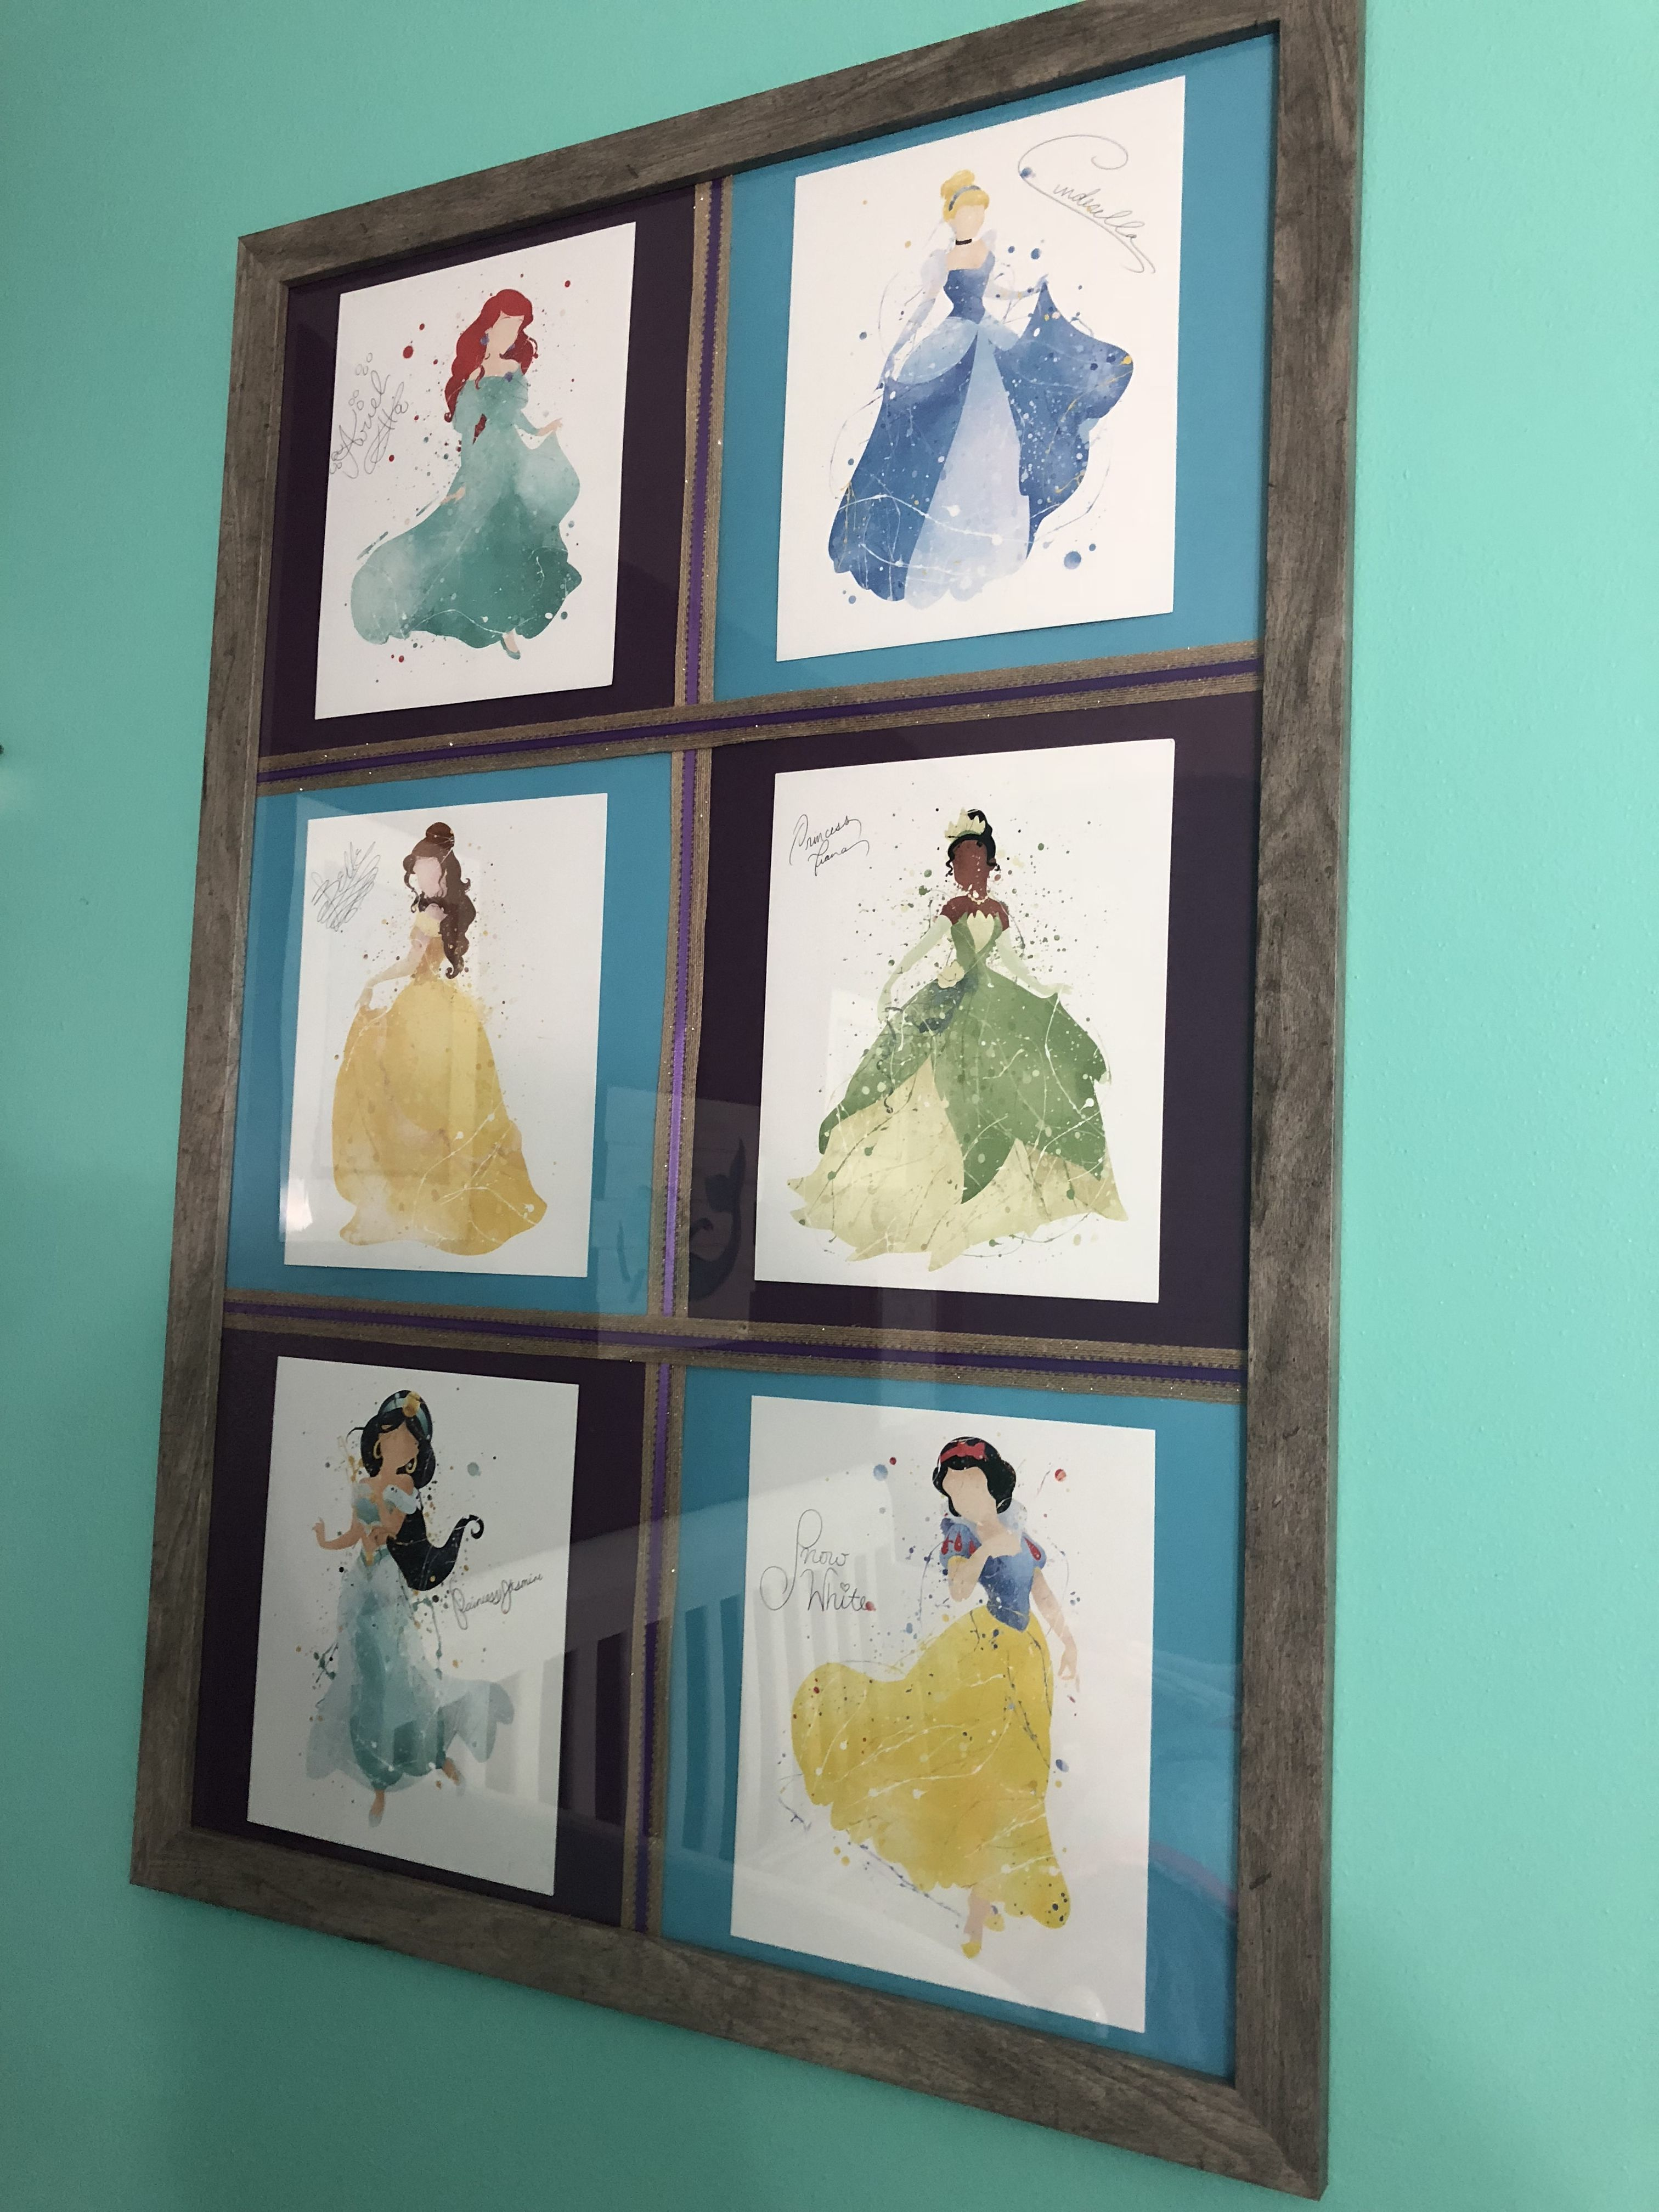 Disney Princesses art with Princess signatures